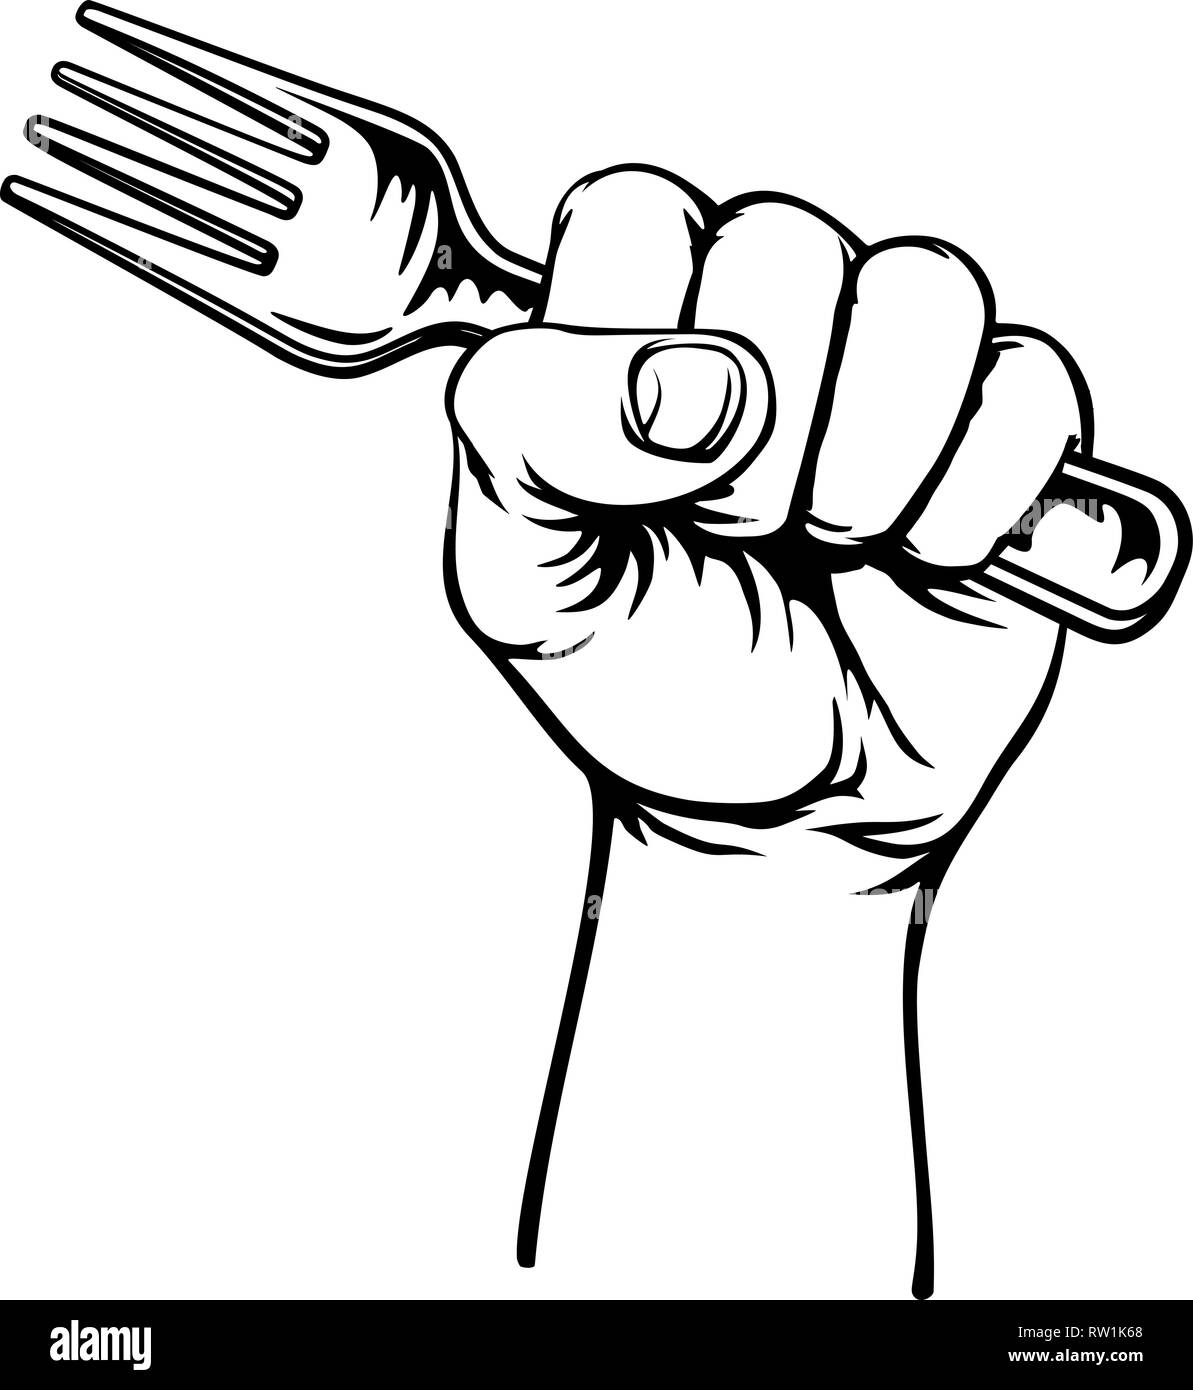 Hand Holding Fork - Stock Image